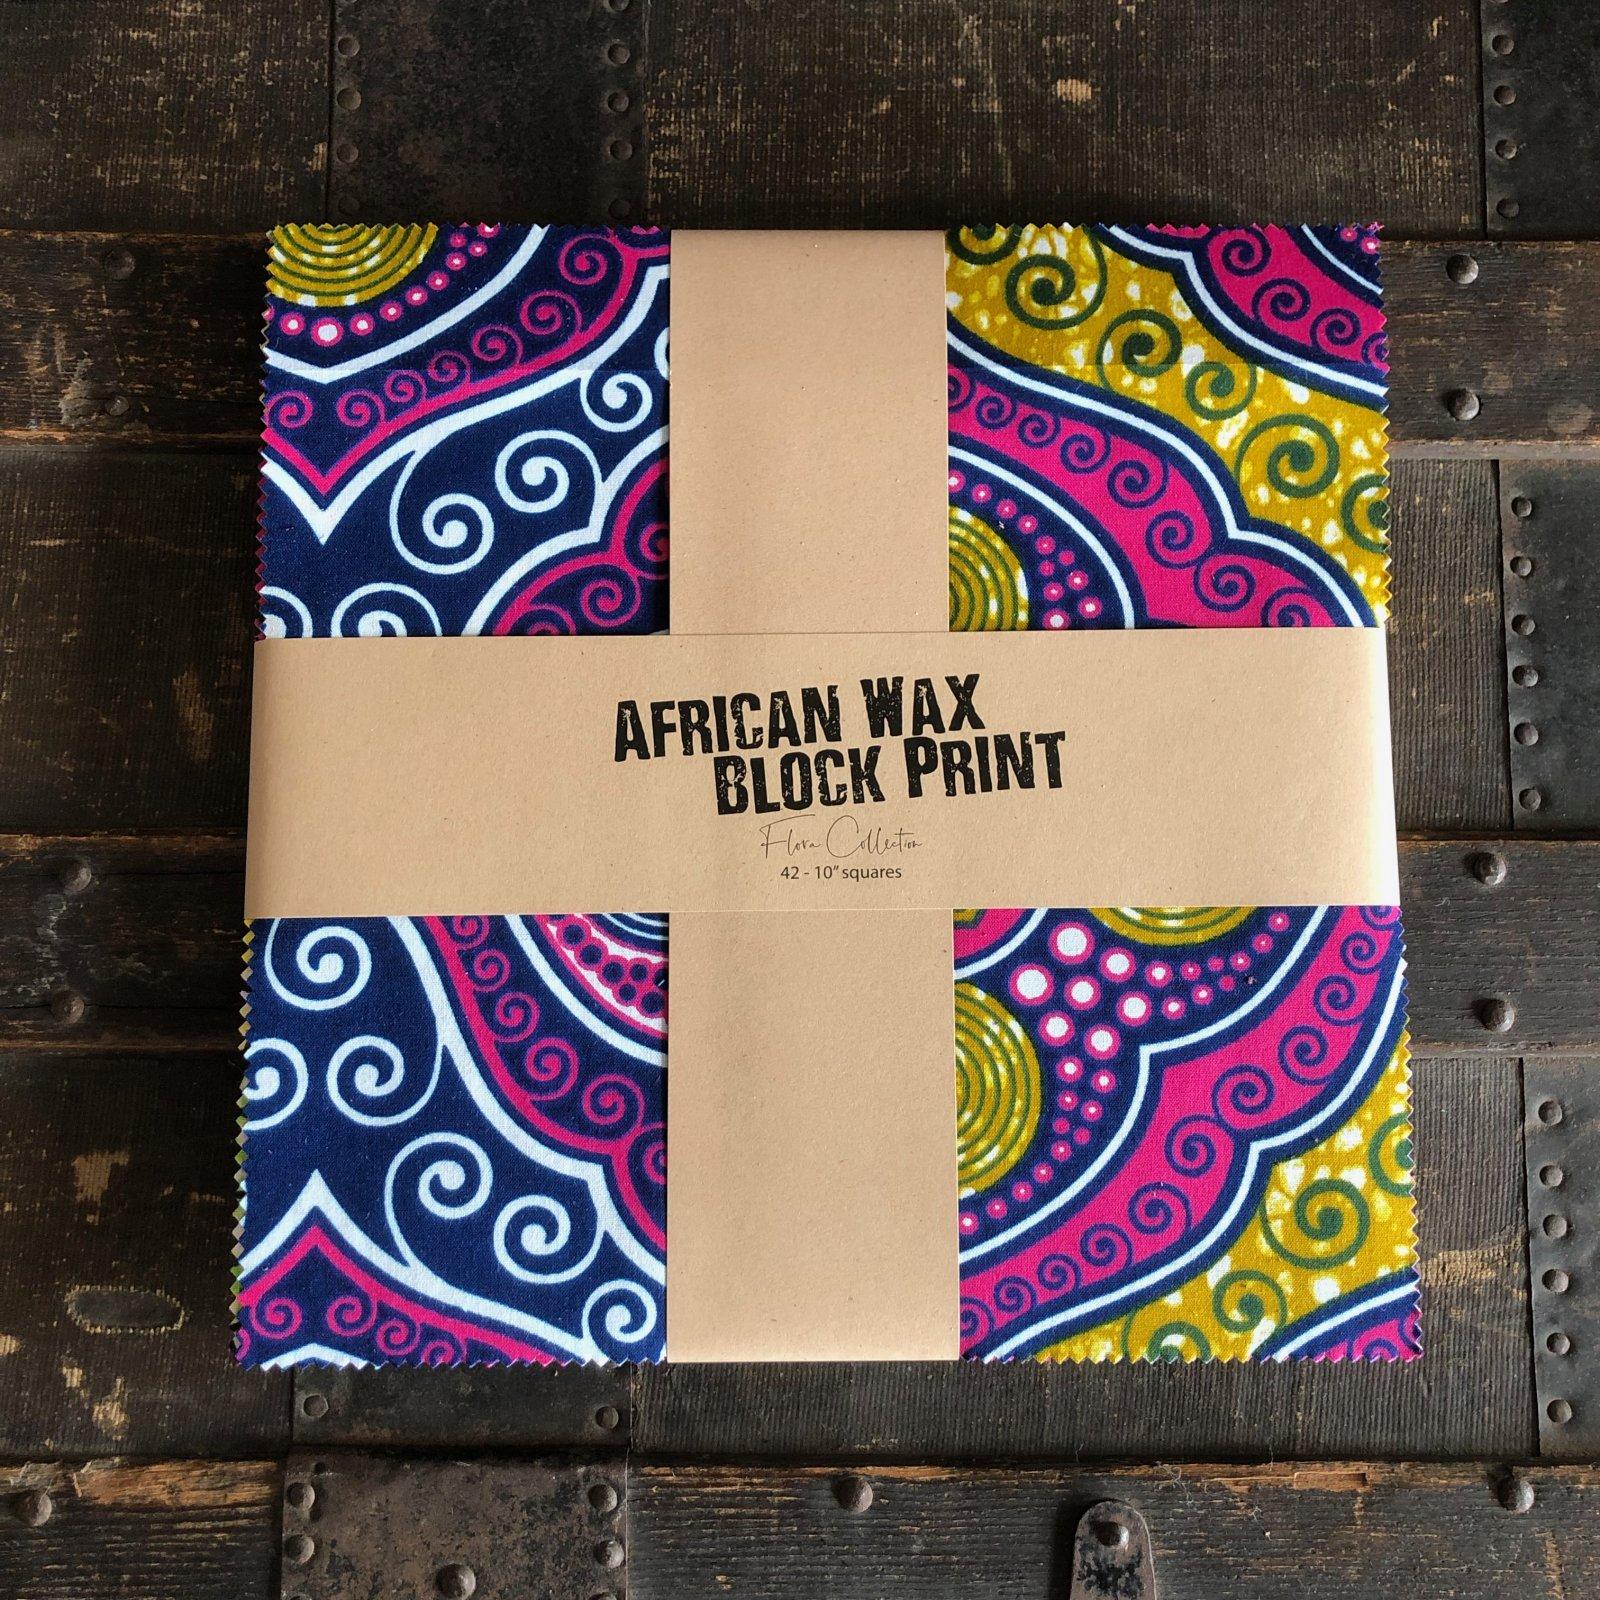 African Wax Block Print Cake - (42) 10 squares